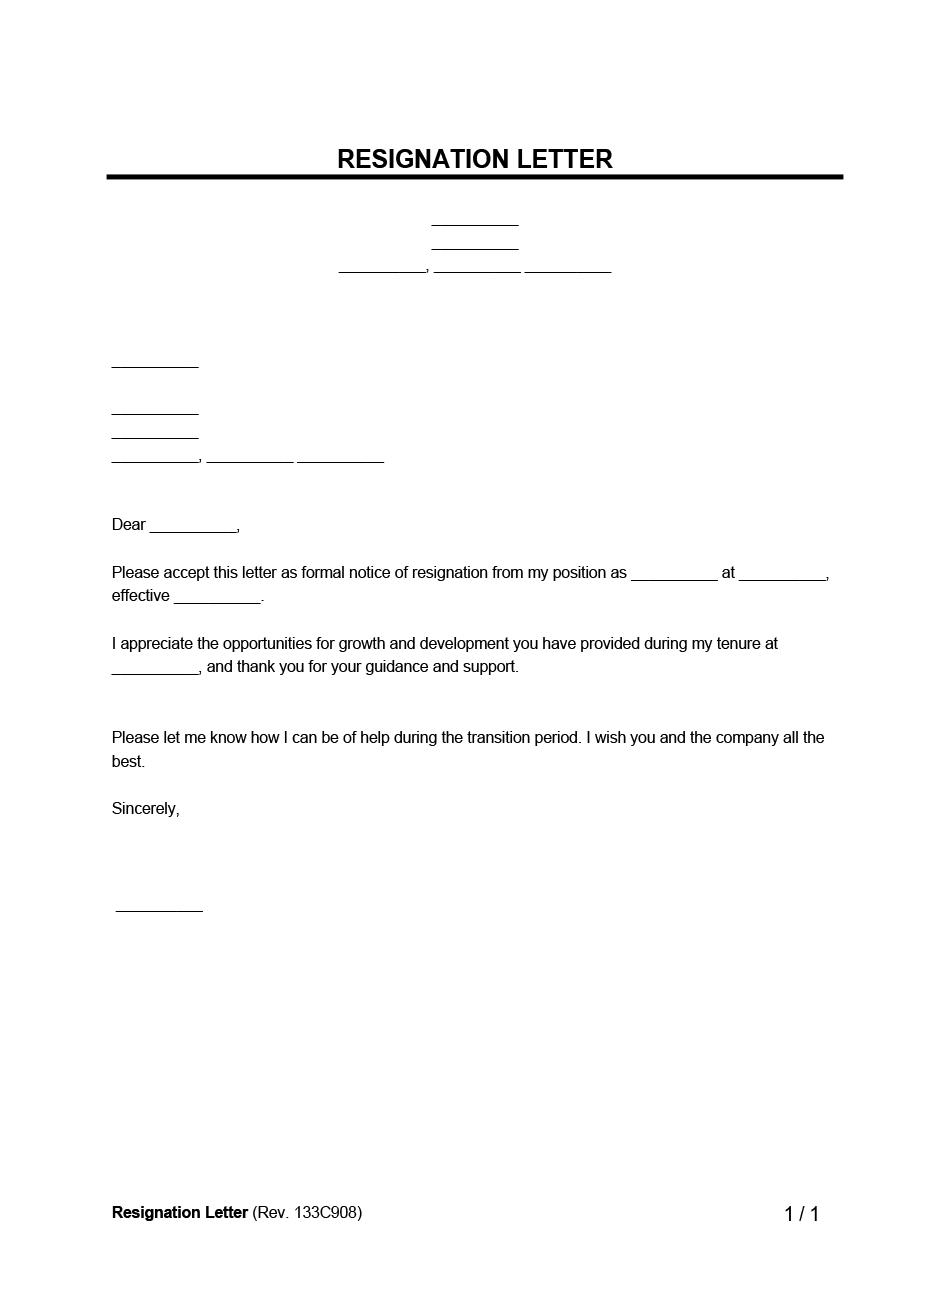 Resignation Letter Template   Legal Templates